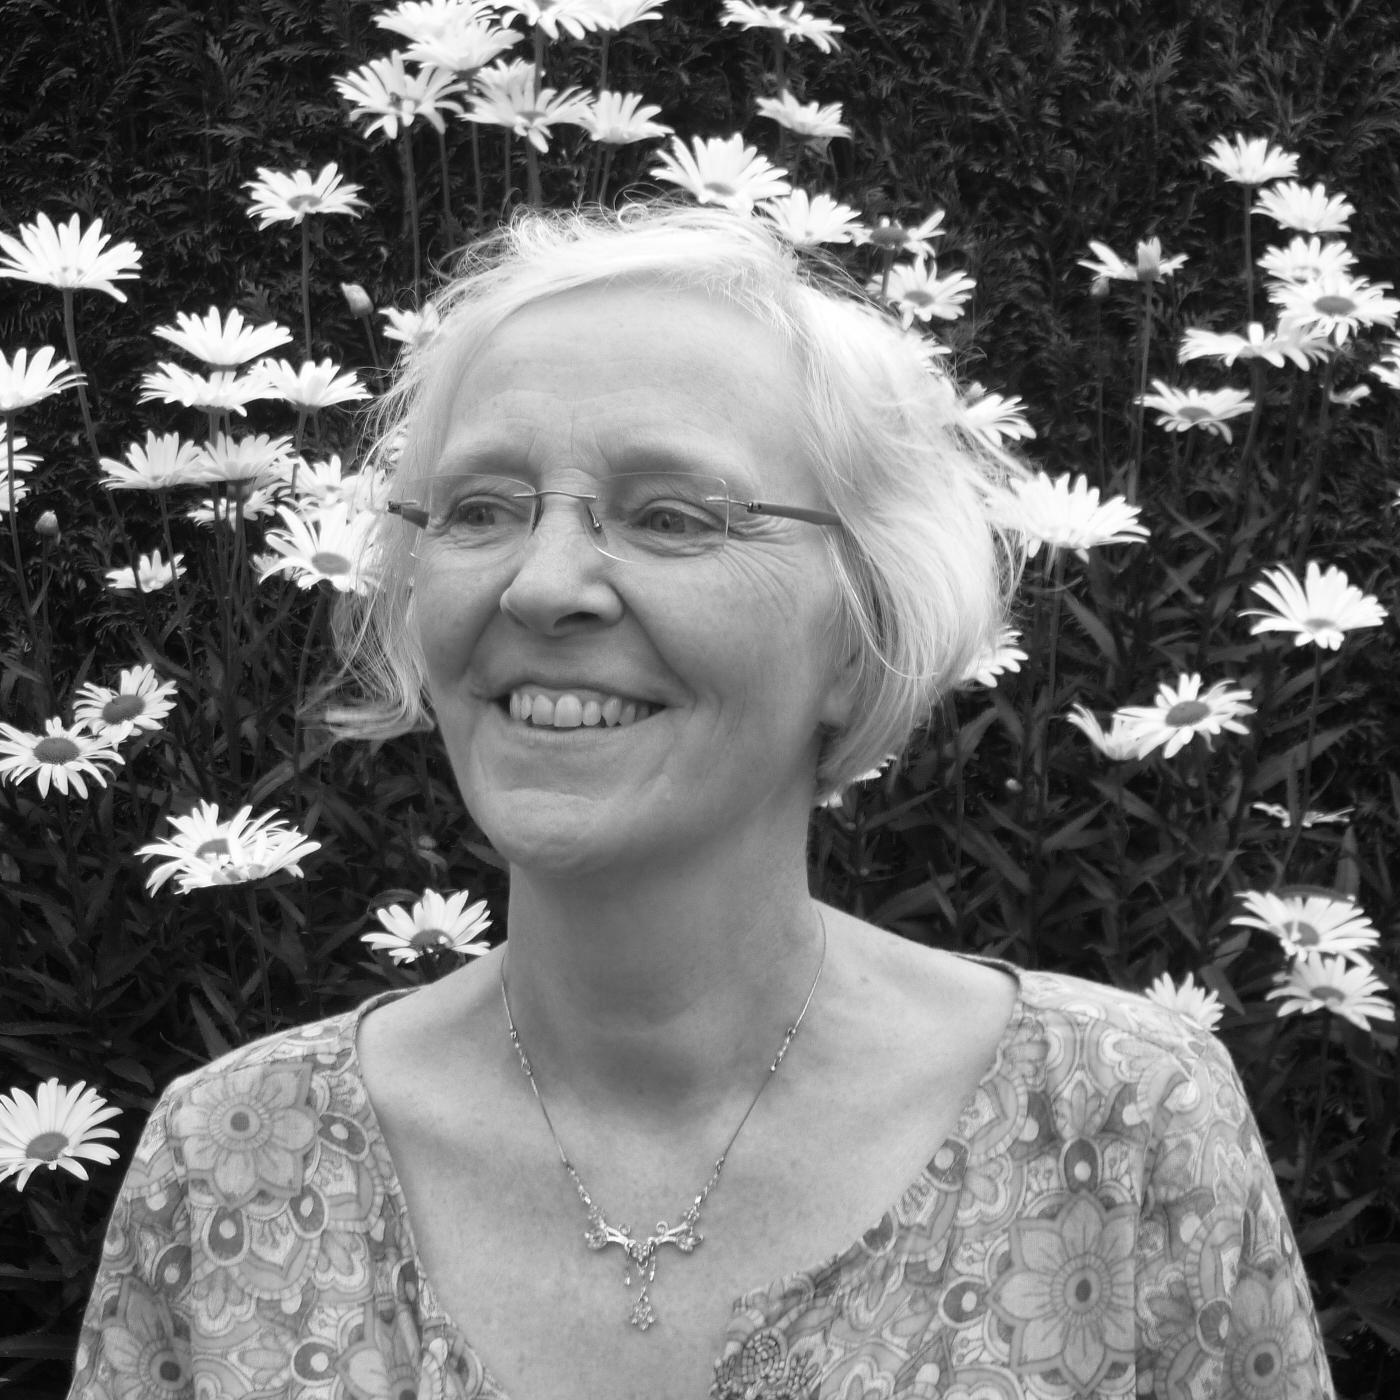 Marion van der Horst